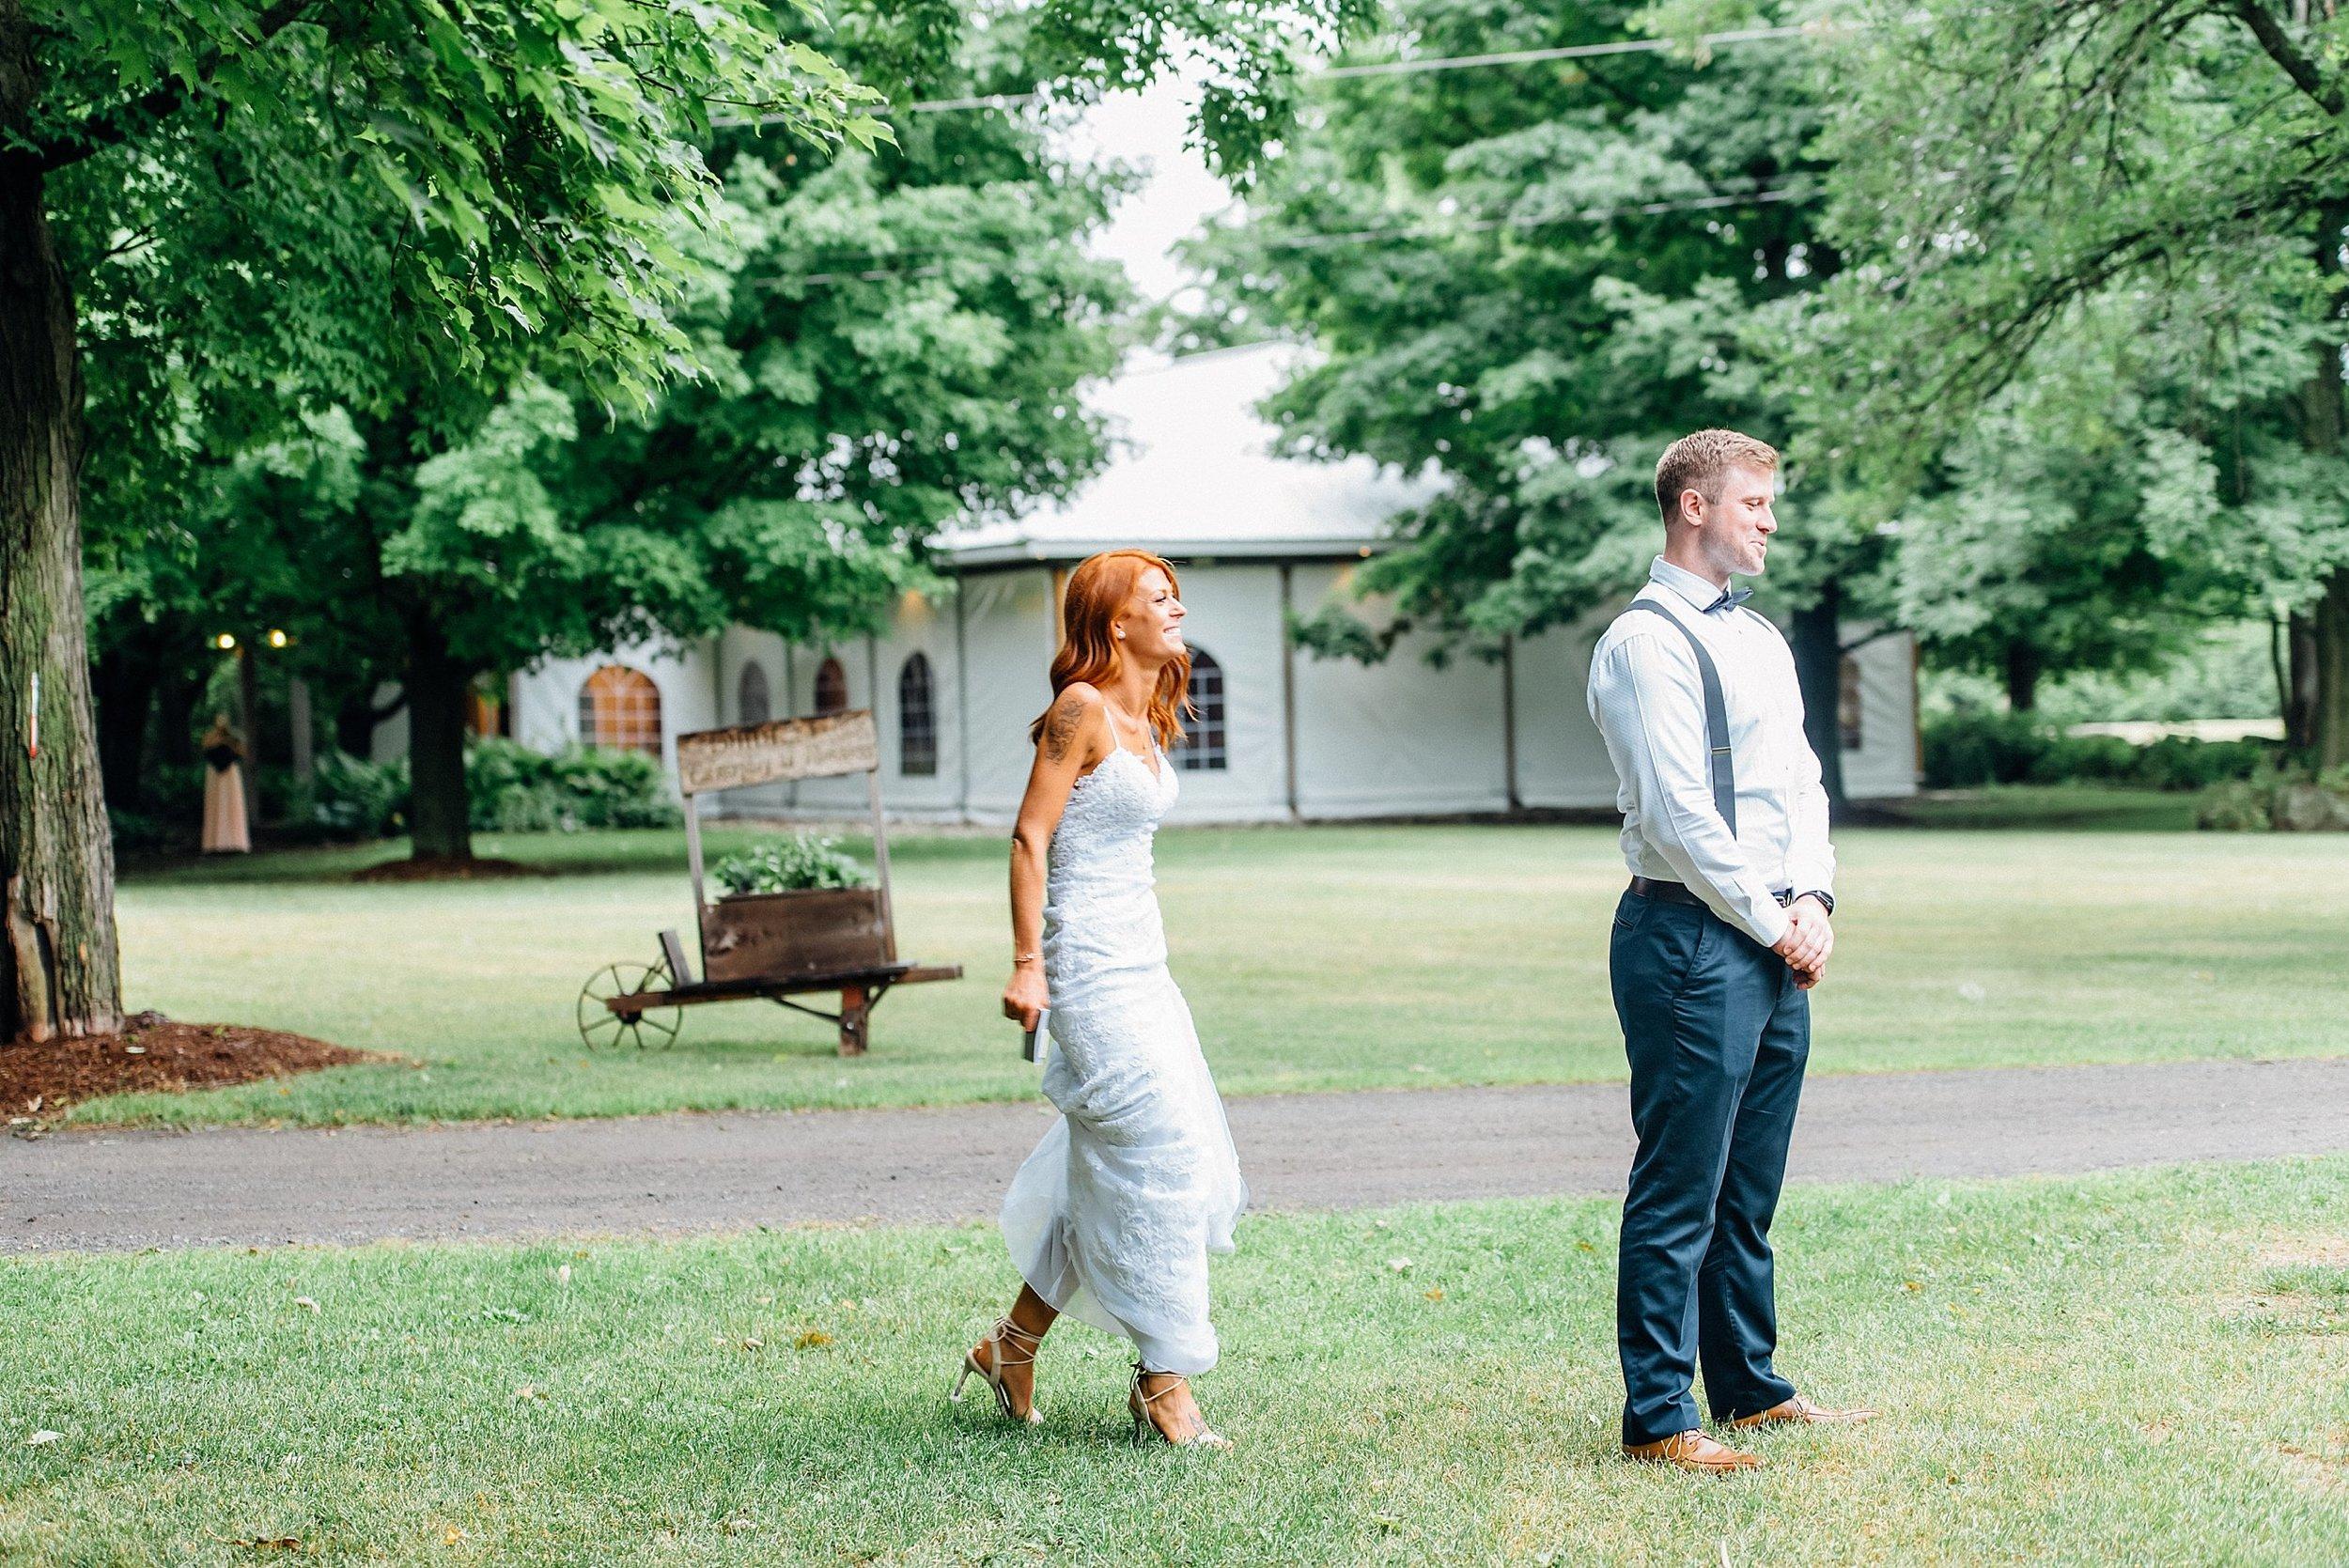 Ottawa Wedding Photographer - Stanley's Olde Maple Lane Barn Wedding - Ali & Batoul Photography_0009.jpg